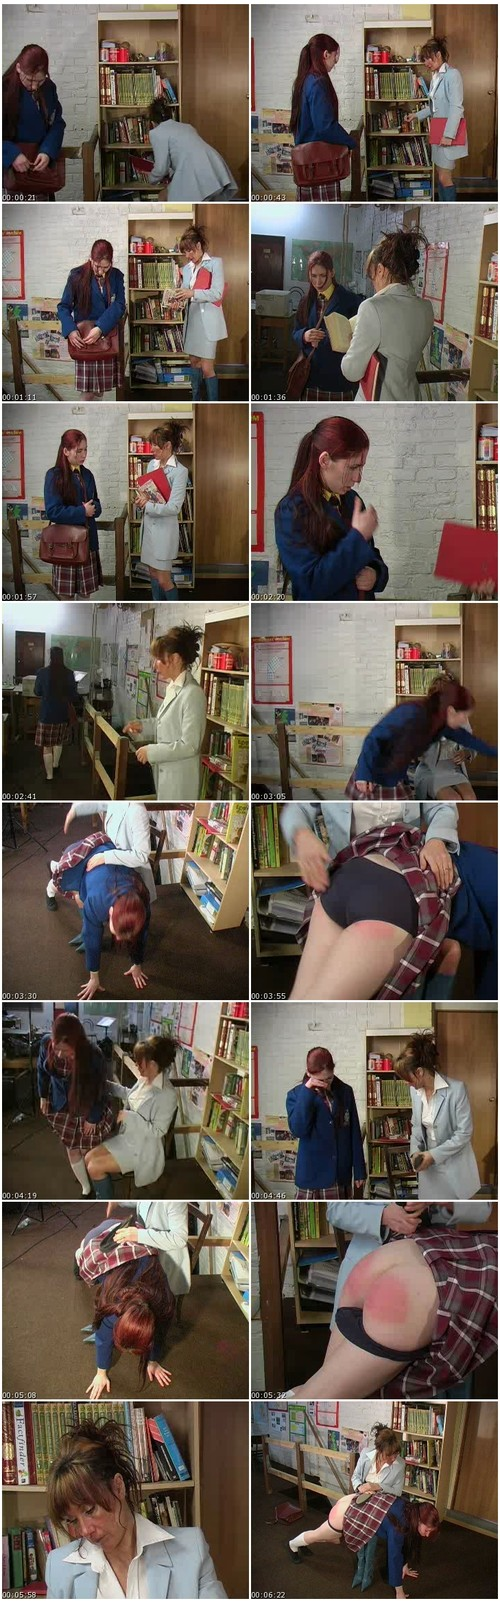 spanking315_thumb_m.jpg